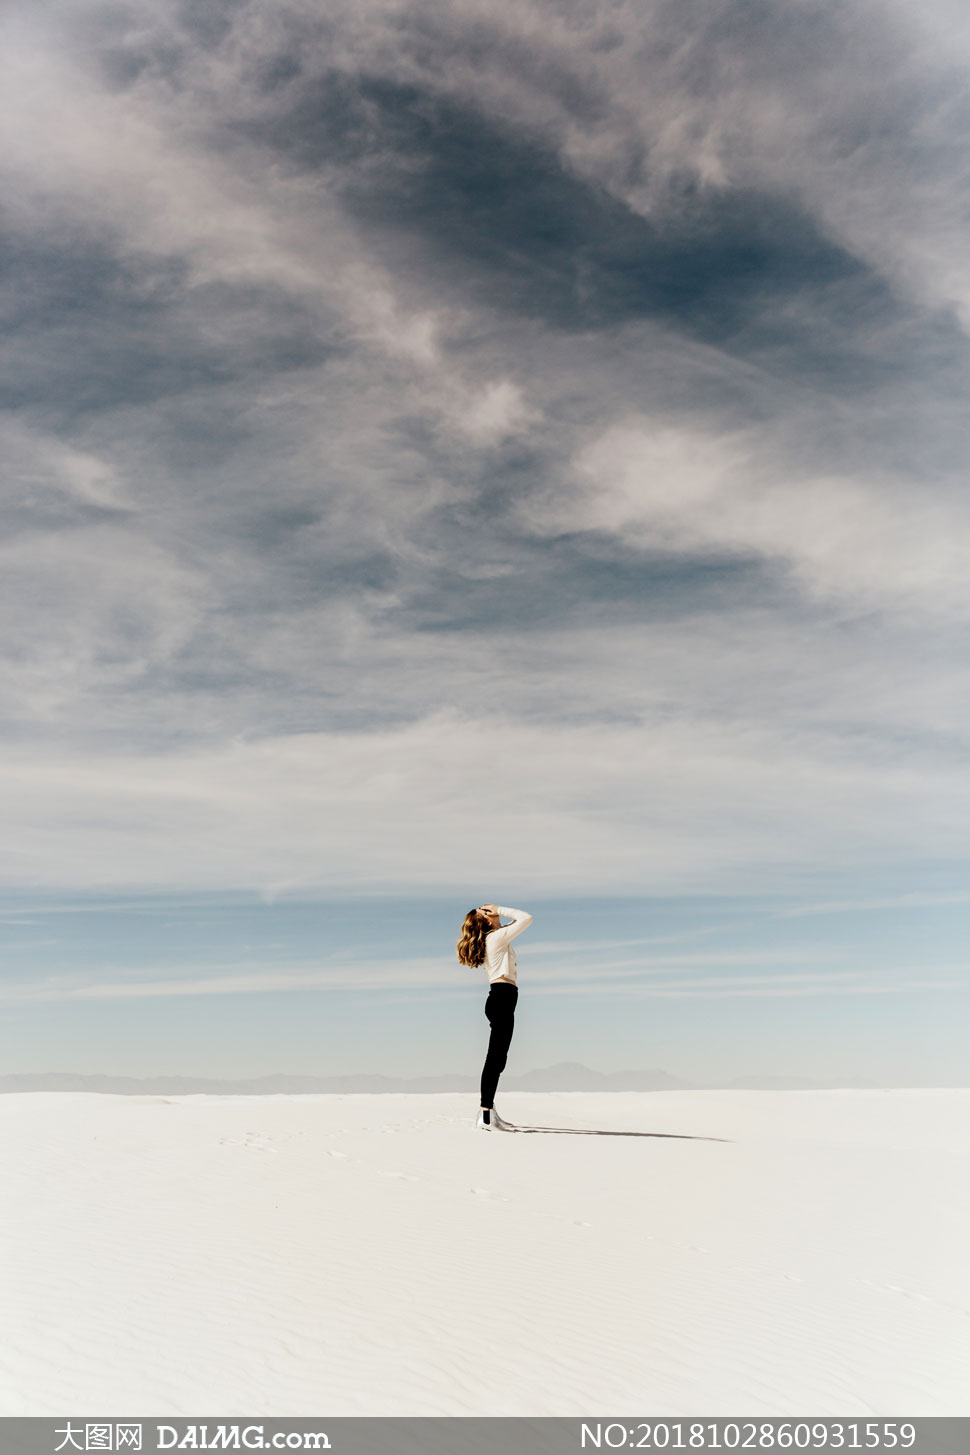 cc0; 关 键 词: 高清摄影大图图片素材自然风景风光人物侧面海边海水